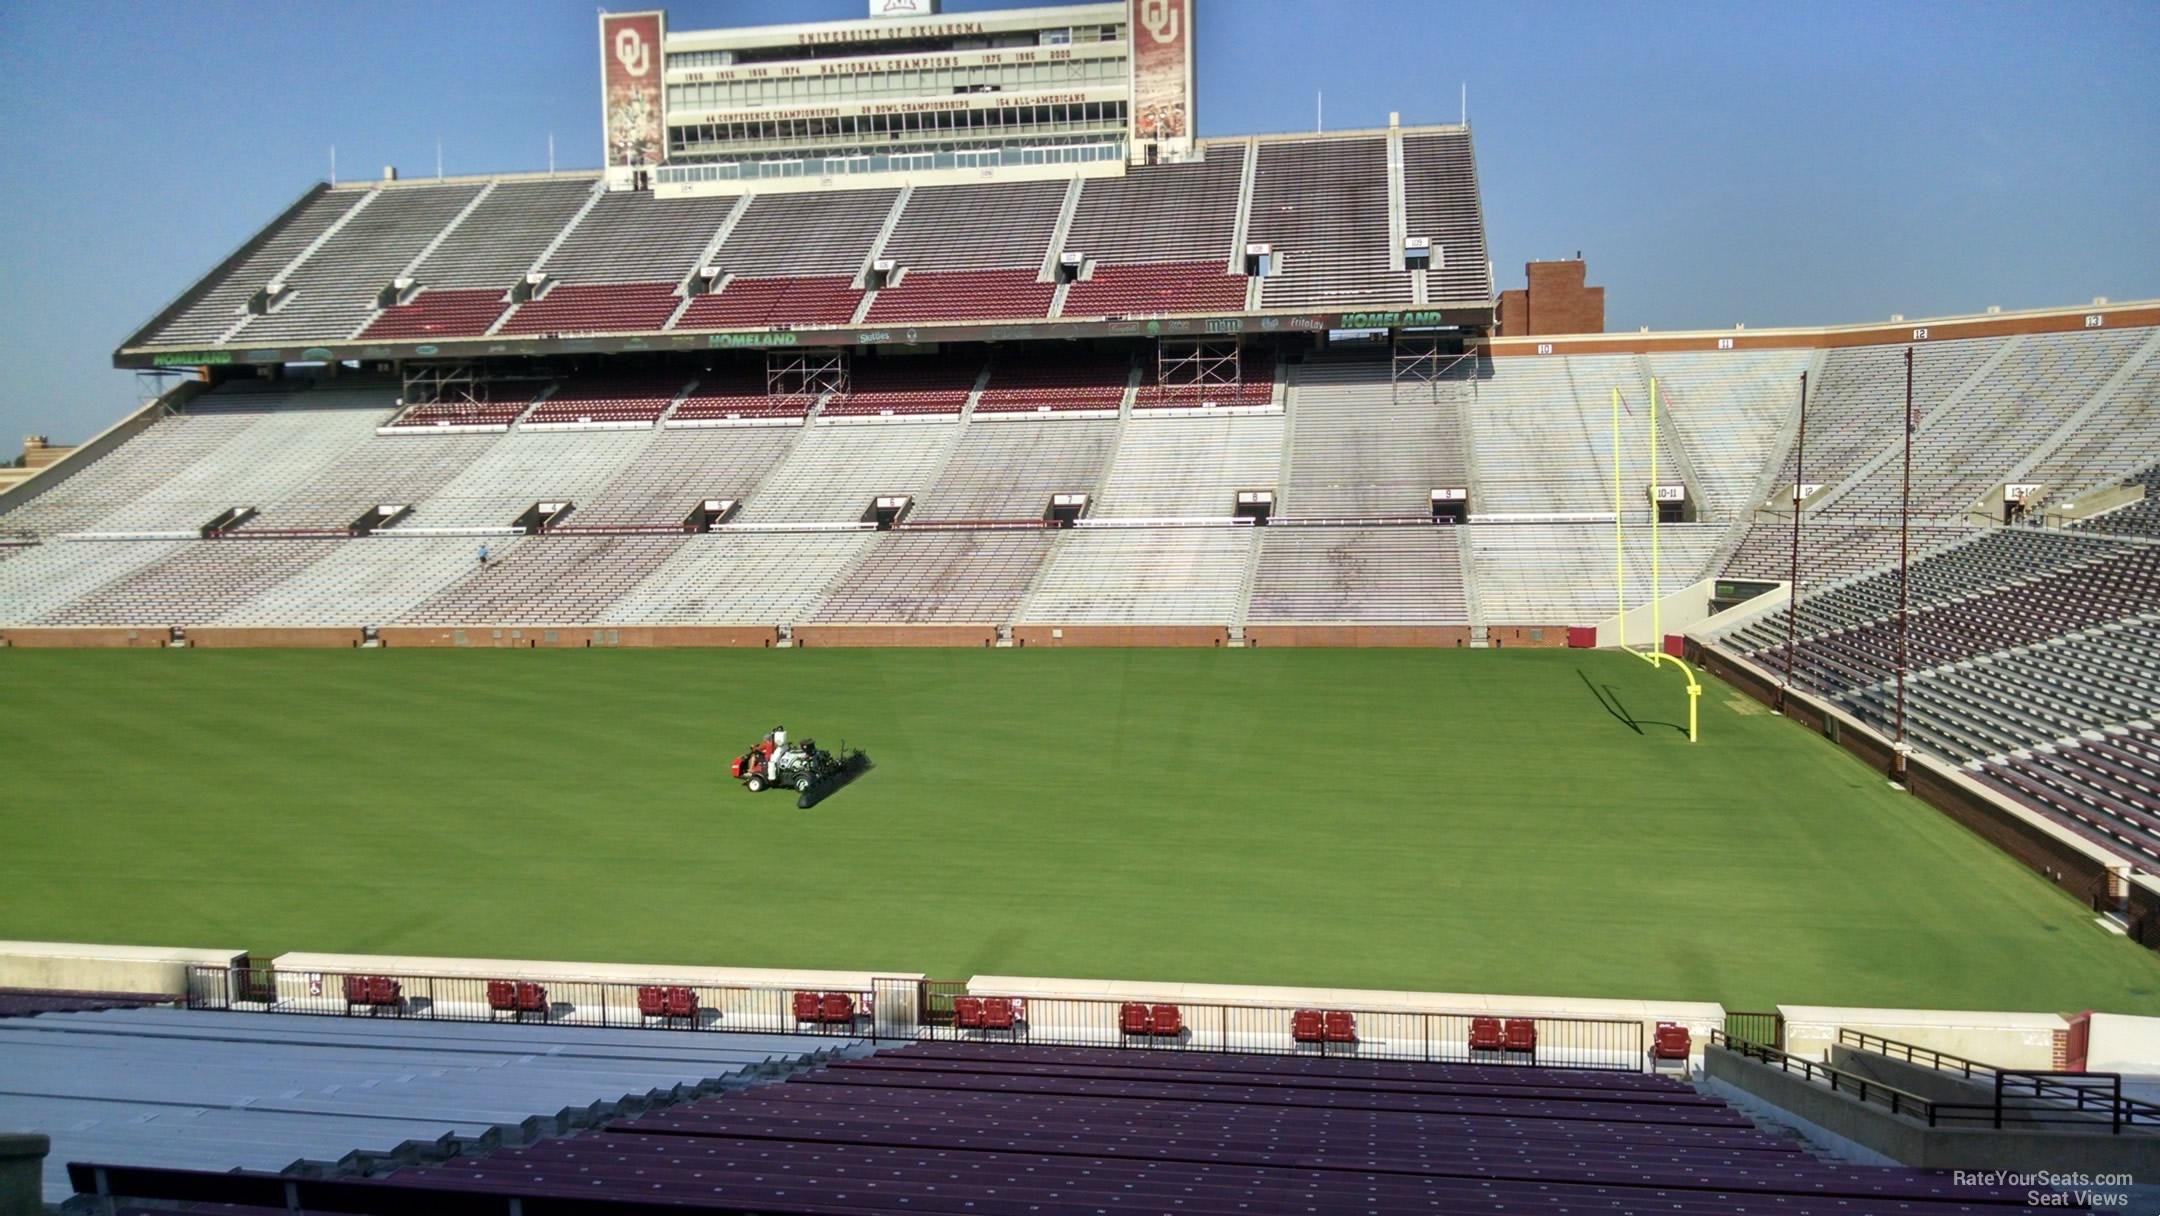 Oklahoma Memorial Stadium Section 27 - RateYourSeats.com